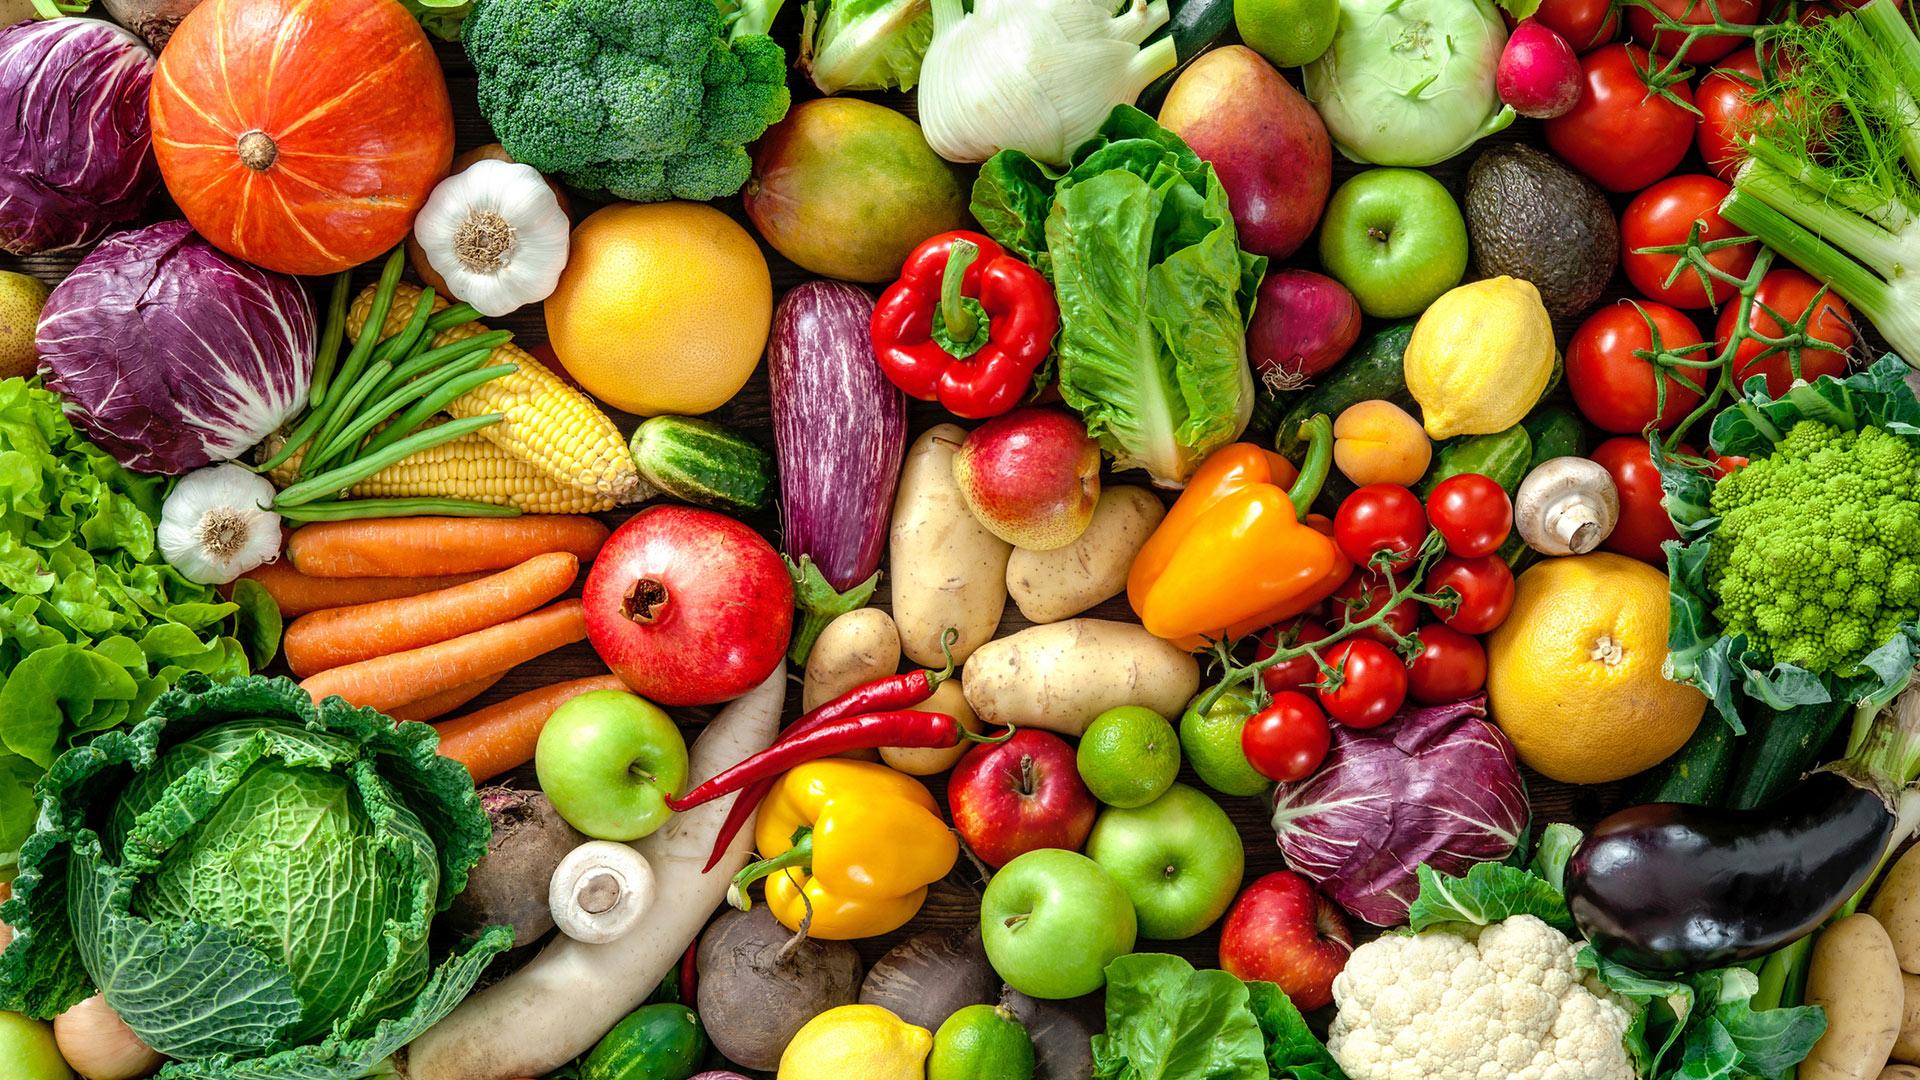 7 claves para conservar frescas frutas y verduras | Telemundo